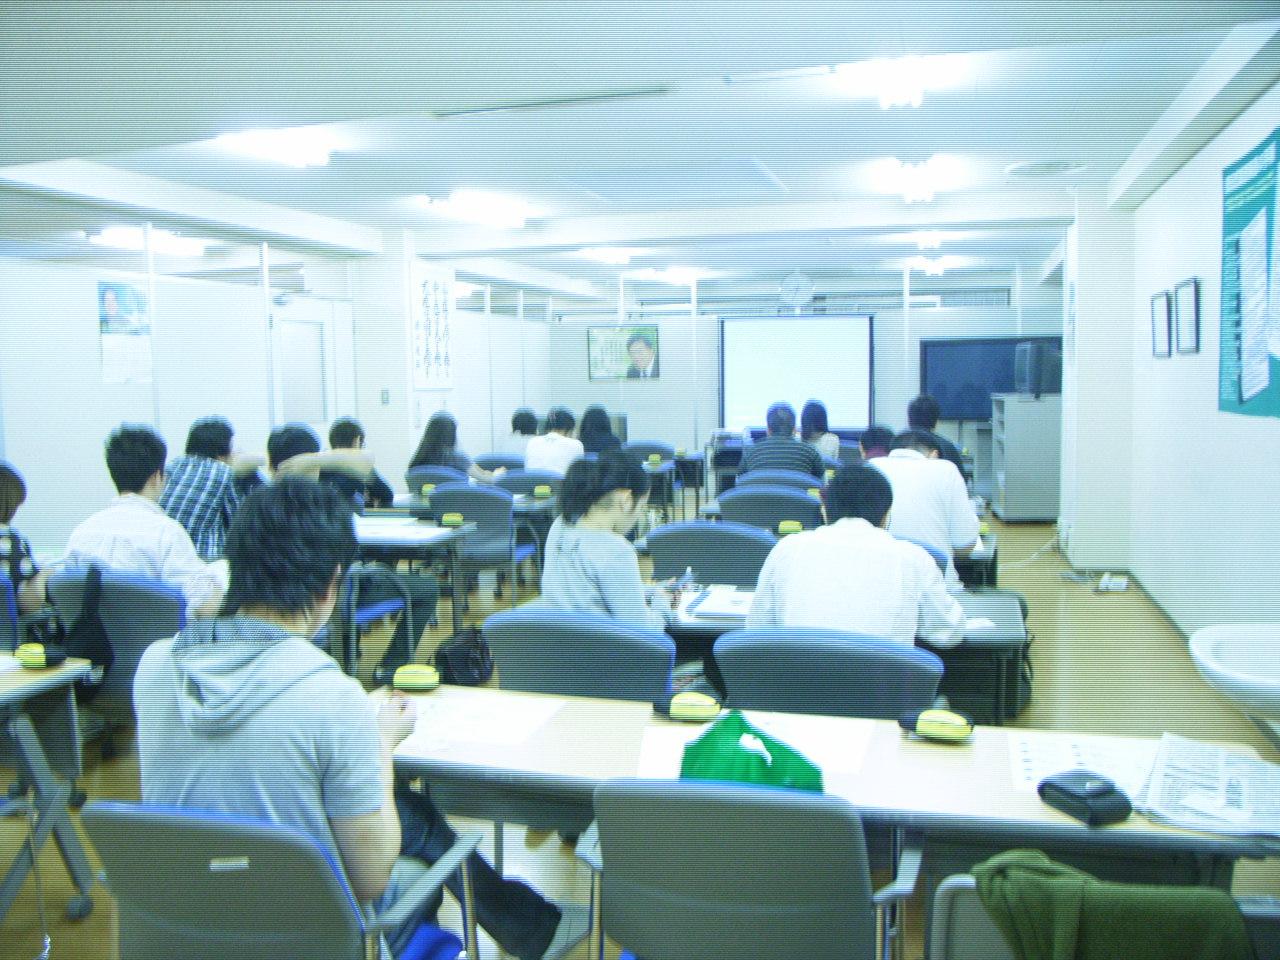 http://blog.higashi-tokushukai.or.jp/ydblog/RIMG0809.JPG